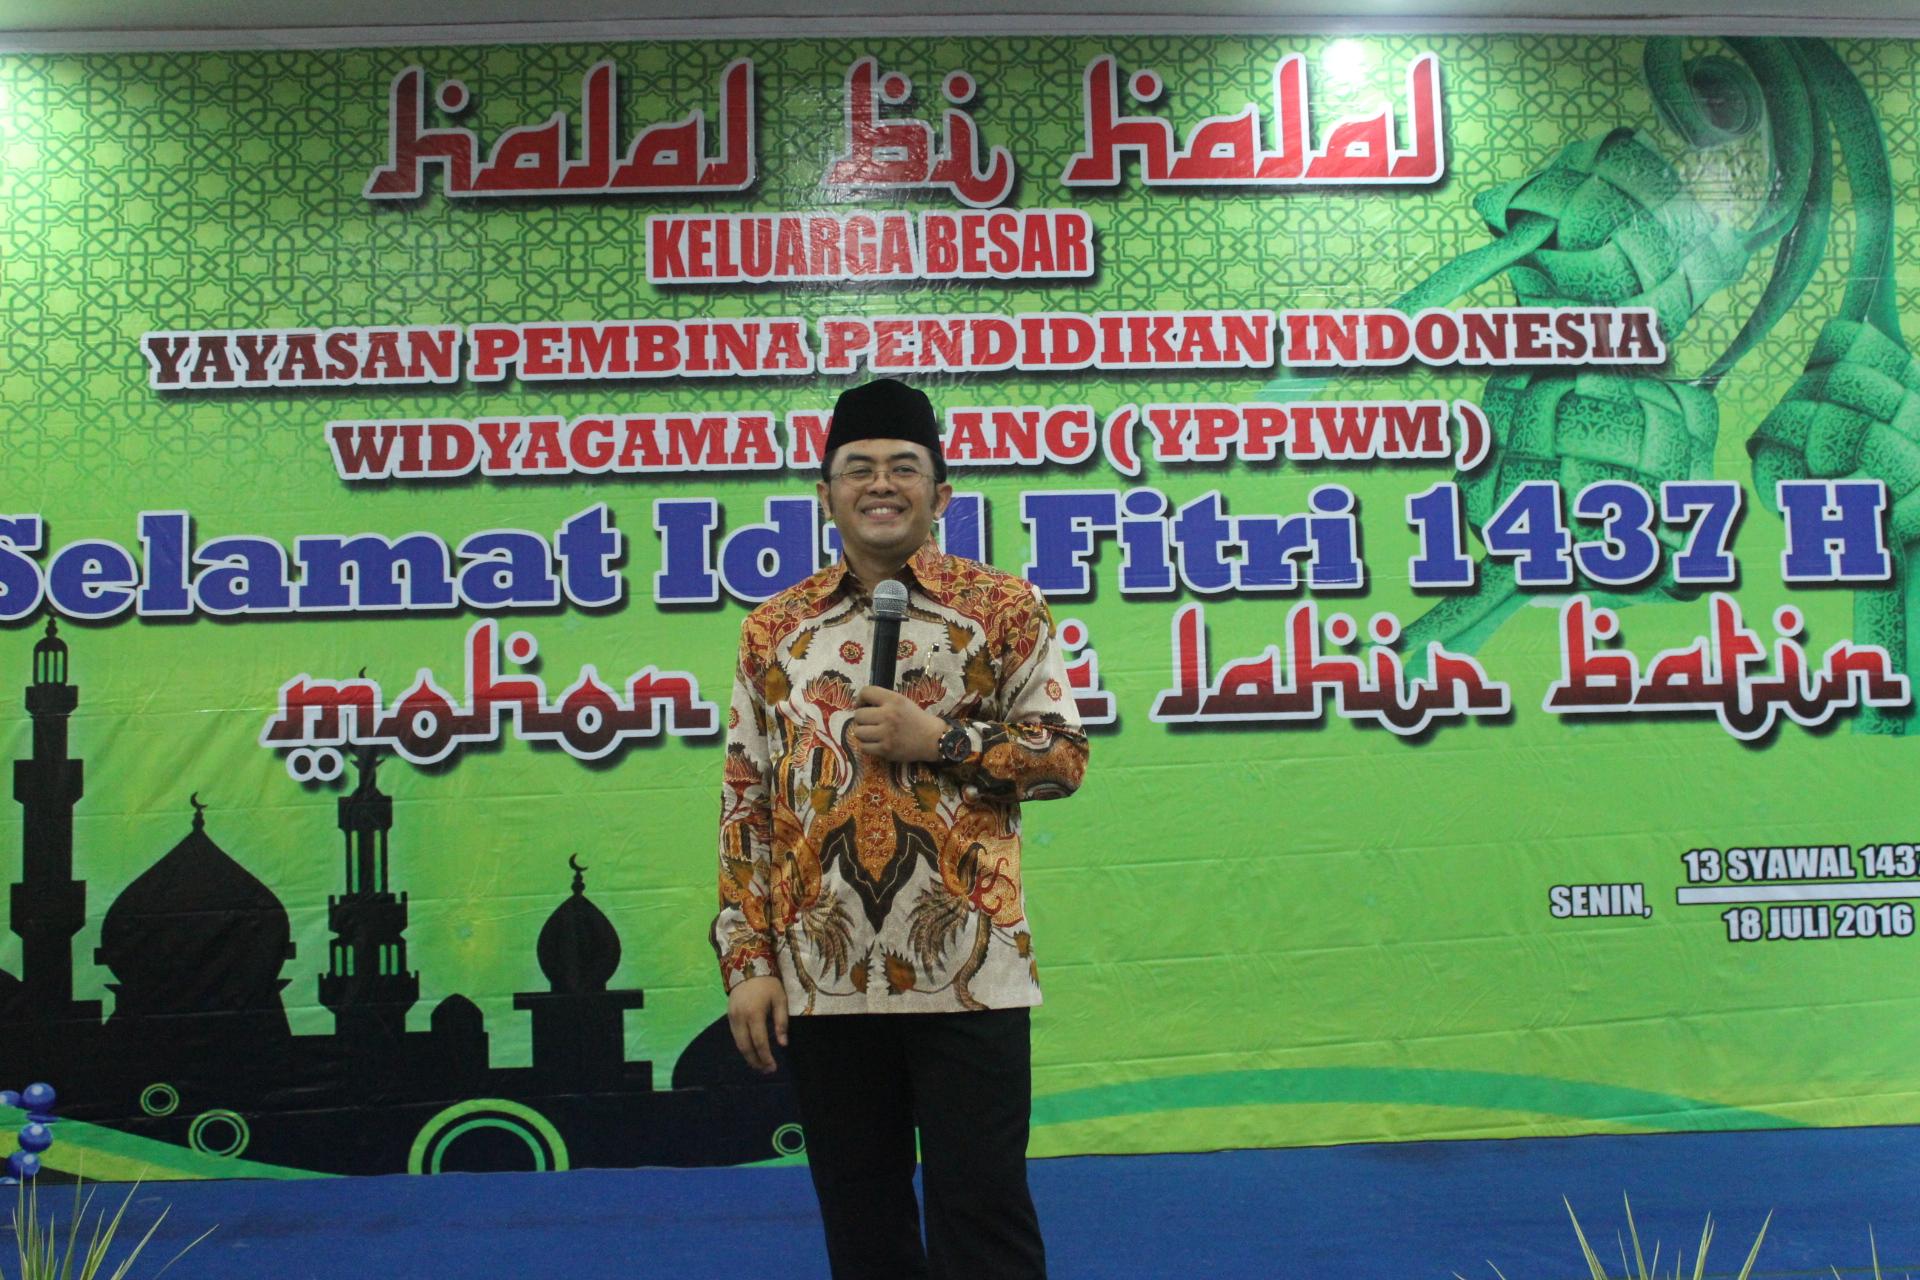 Halal Bihalal Keluarga Besar Yppi Widyagama Malang Universitas